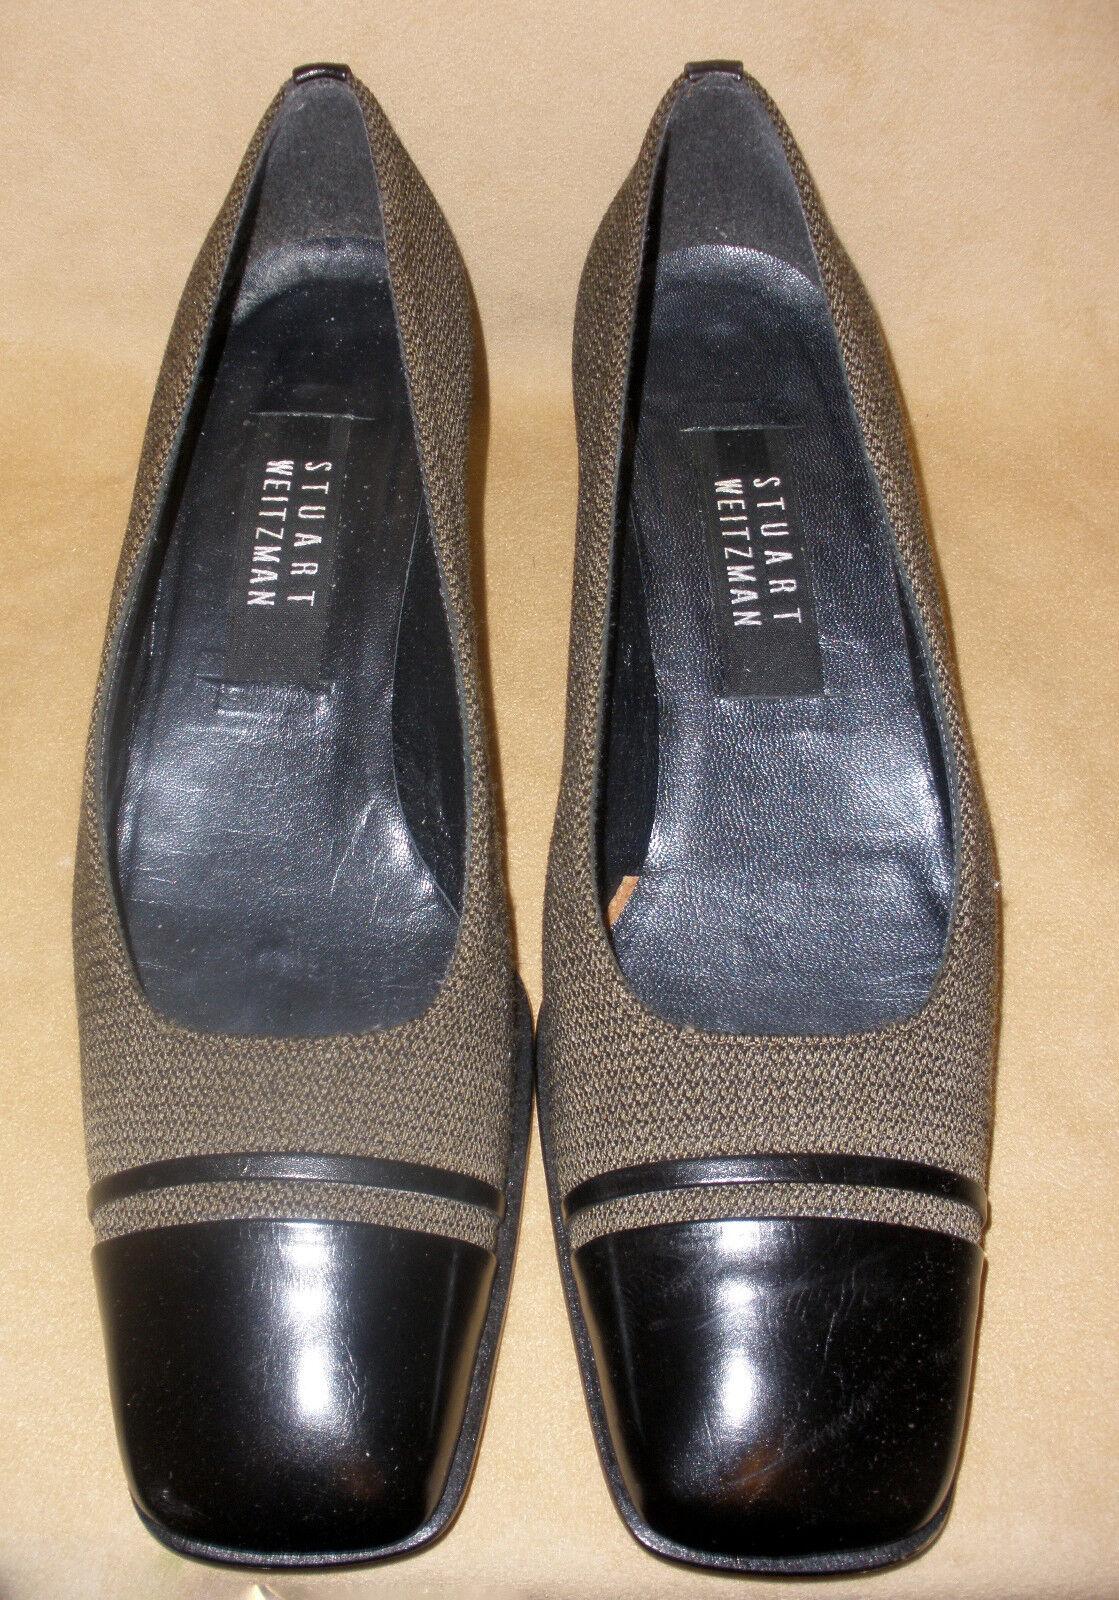 Stuart Weitzman Capable Schuhes in Herringbone Cloth in w/ Leder Accents New in Cloth Box ef58e3